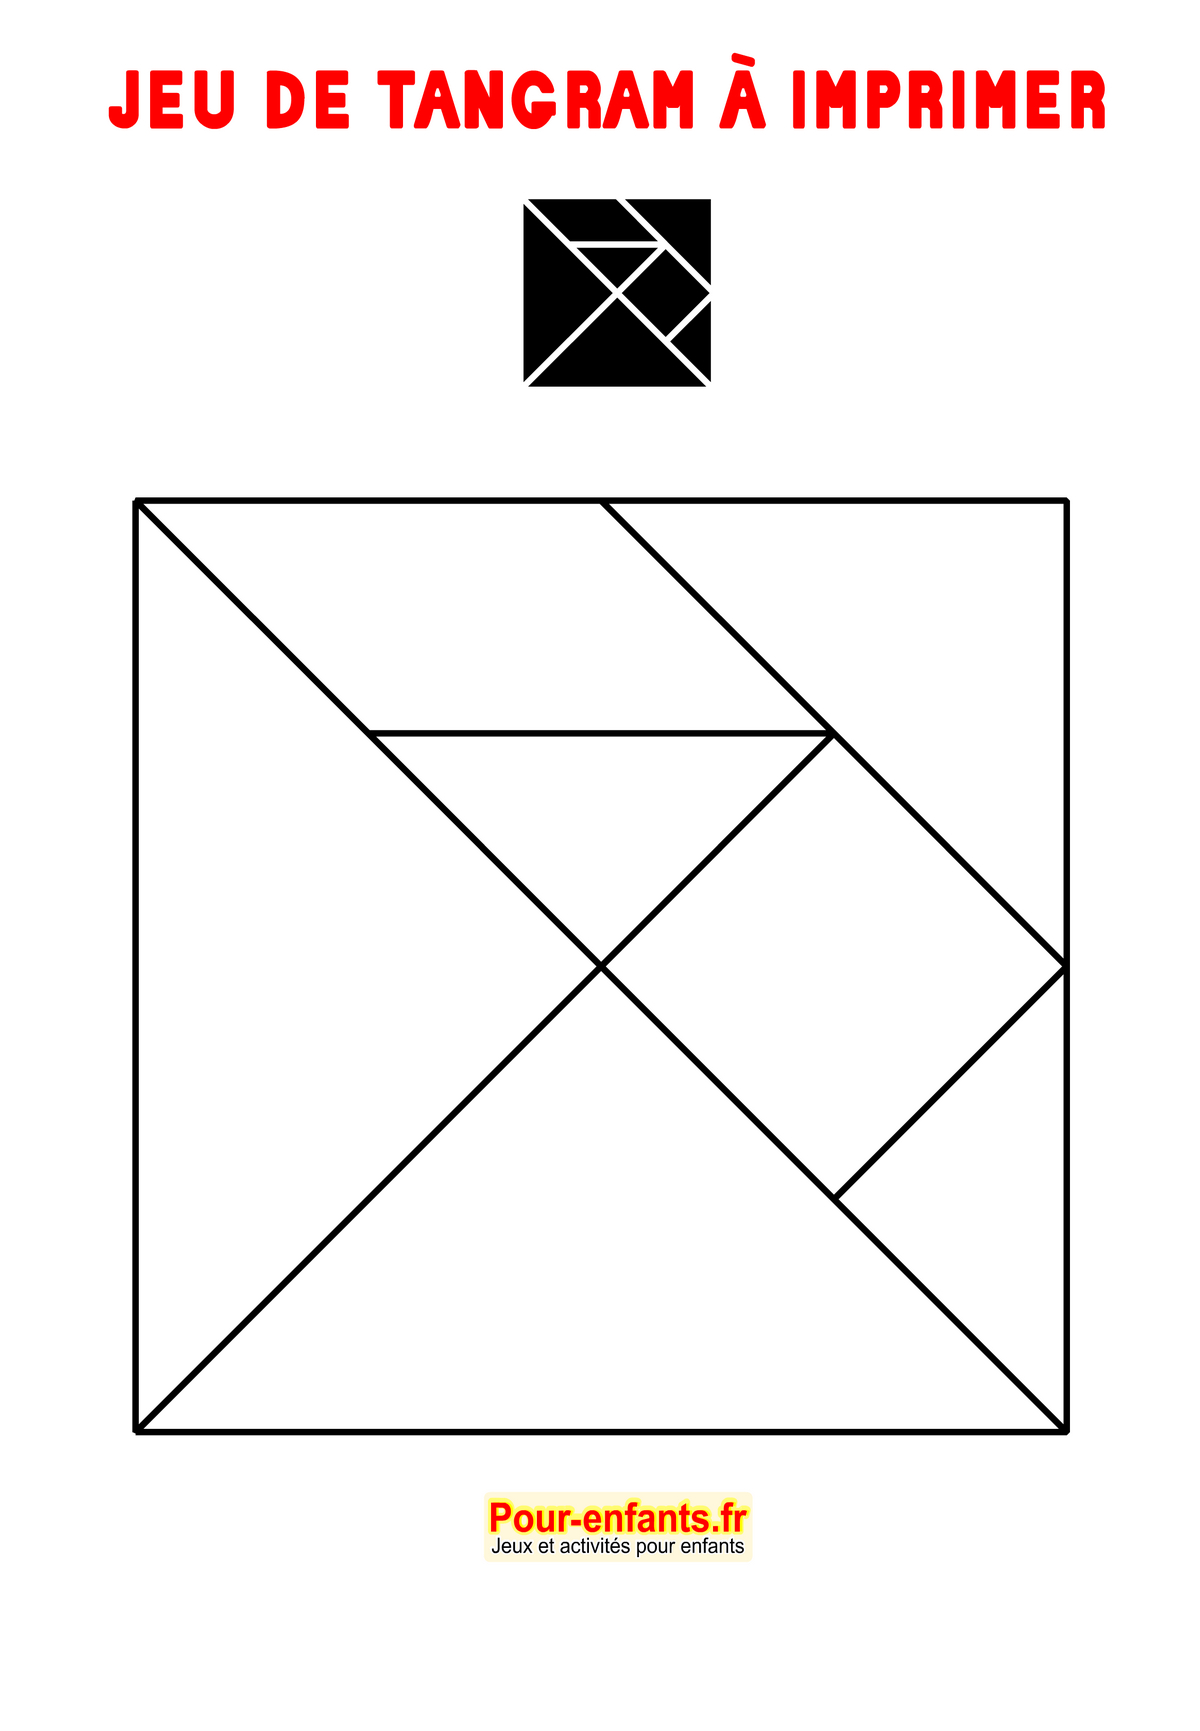 Tangram À Imprimer Maternelle Gratuit Jeux Tangrams encequiconcerne Jeux Maternelle En Ligne